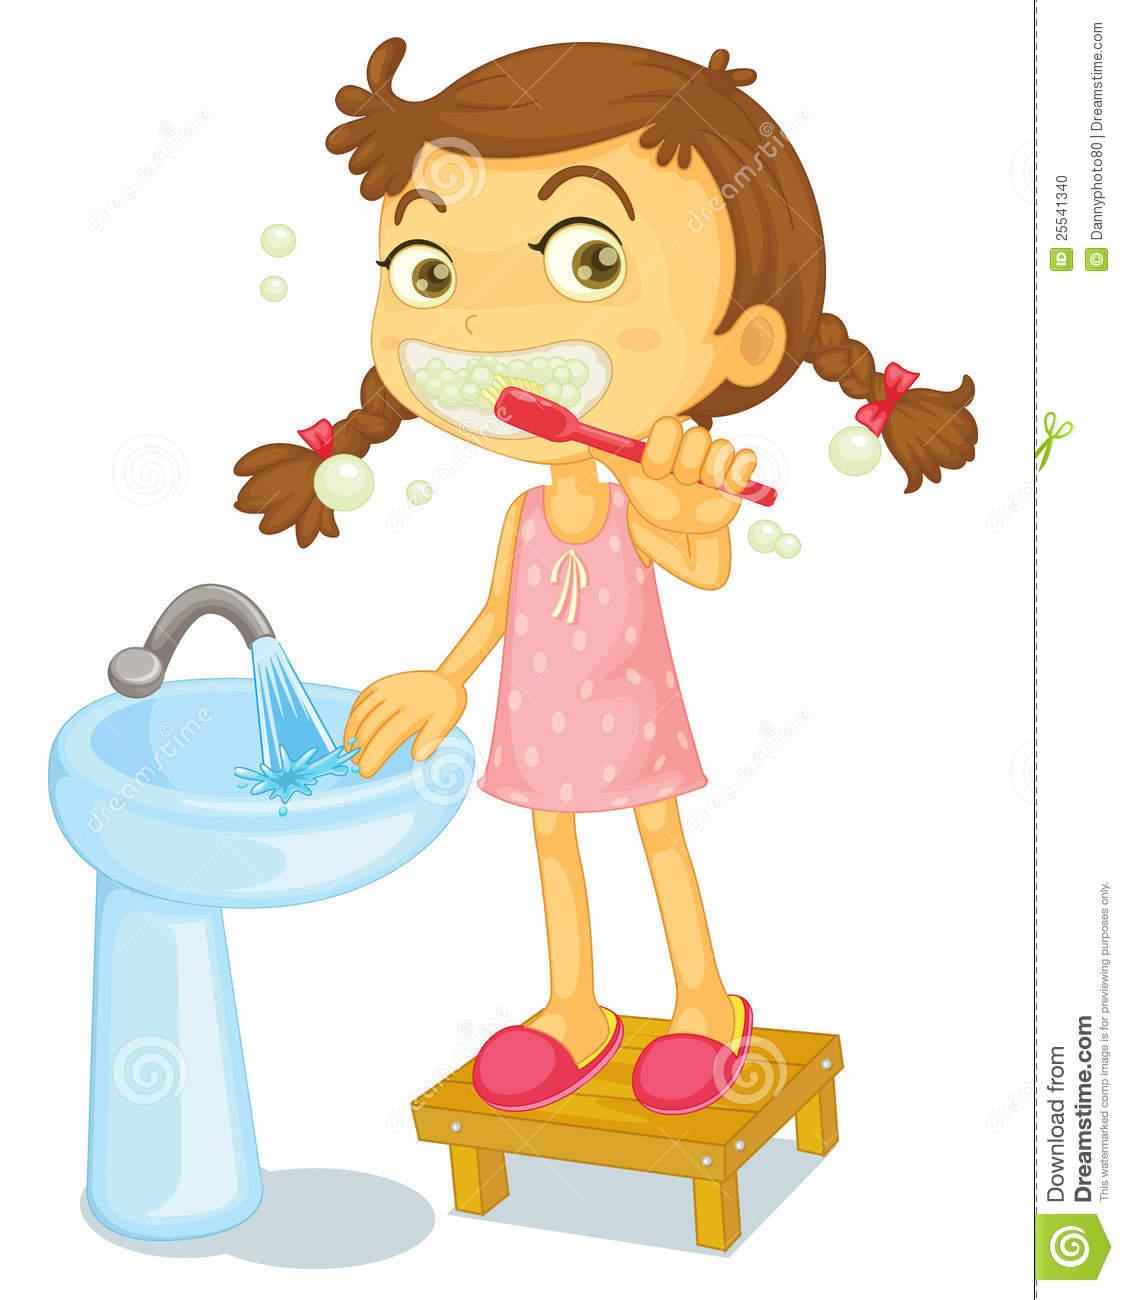 Illustration Of A Girl Brushing Teeth On-Illustration Of A Girl Brushing Teeth On A White Background-14